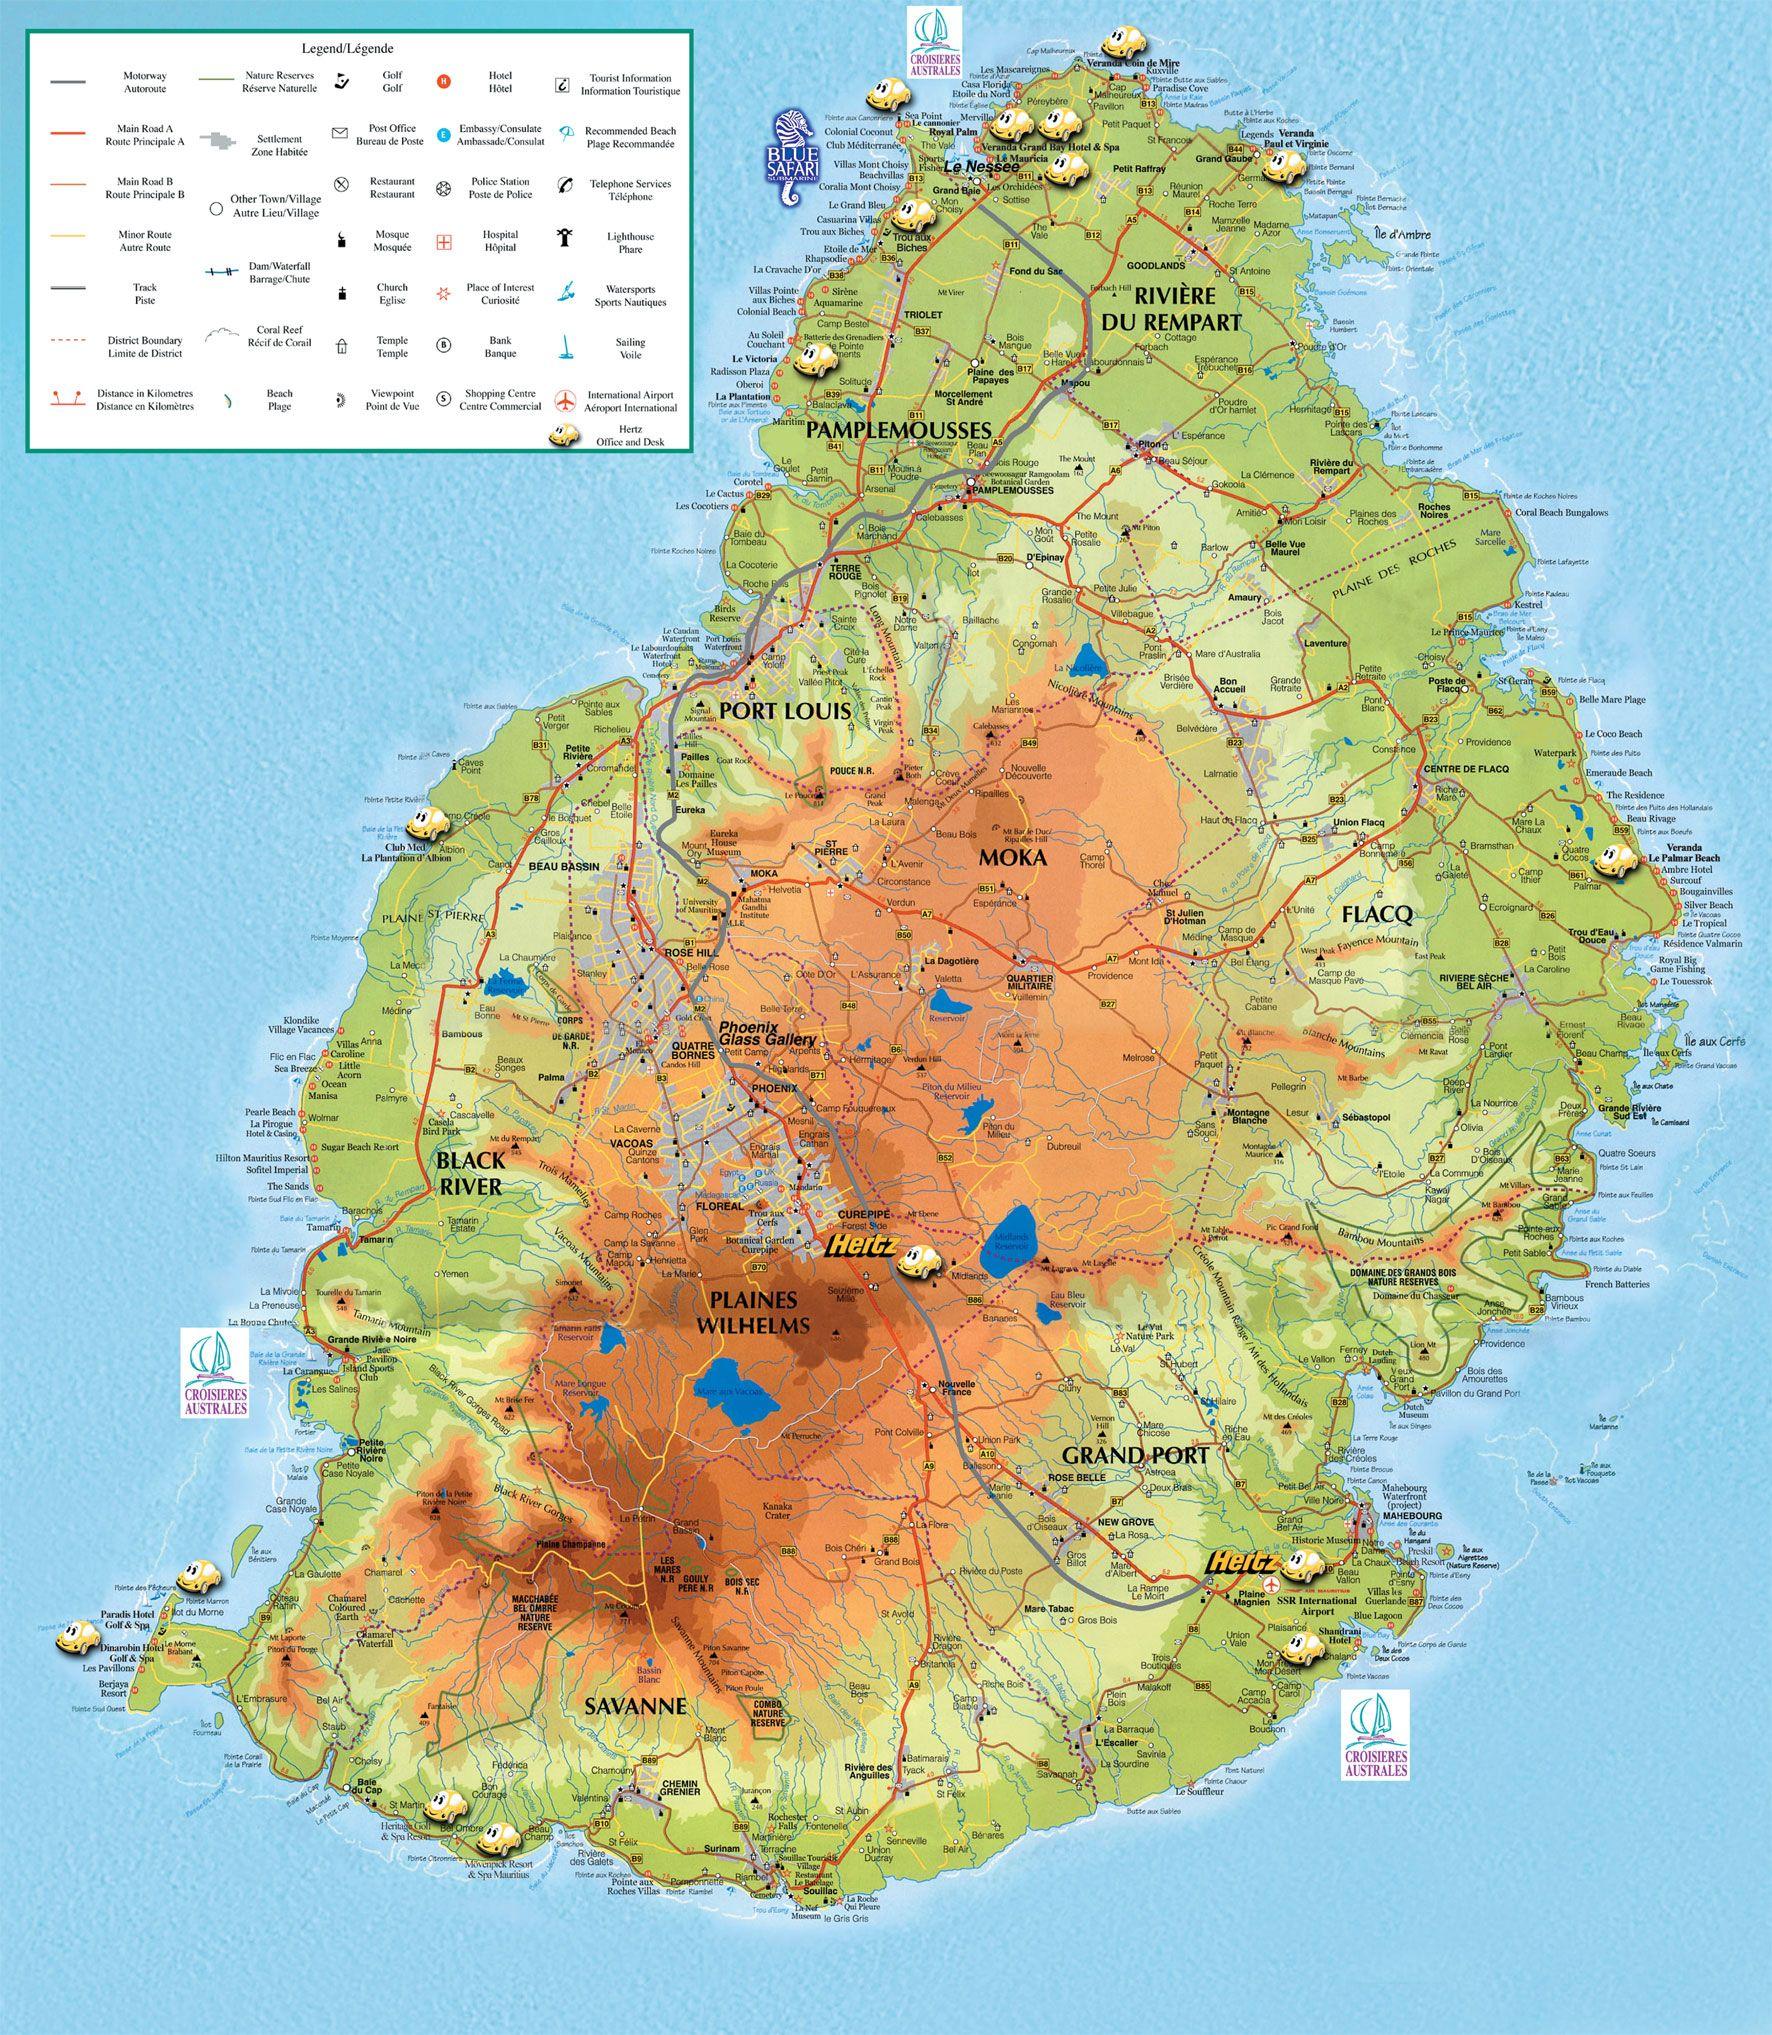 Carte ile maurice le maurice et de la reunion - Where is port louis mauritius located ...